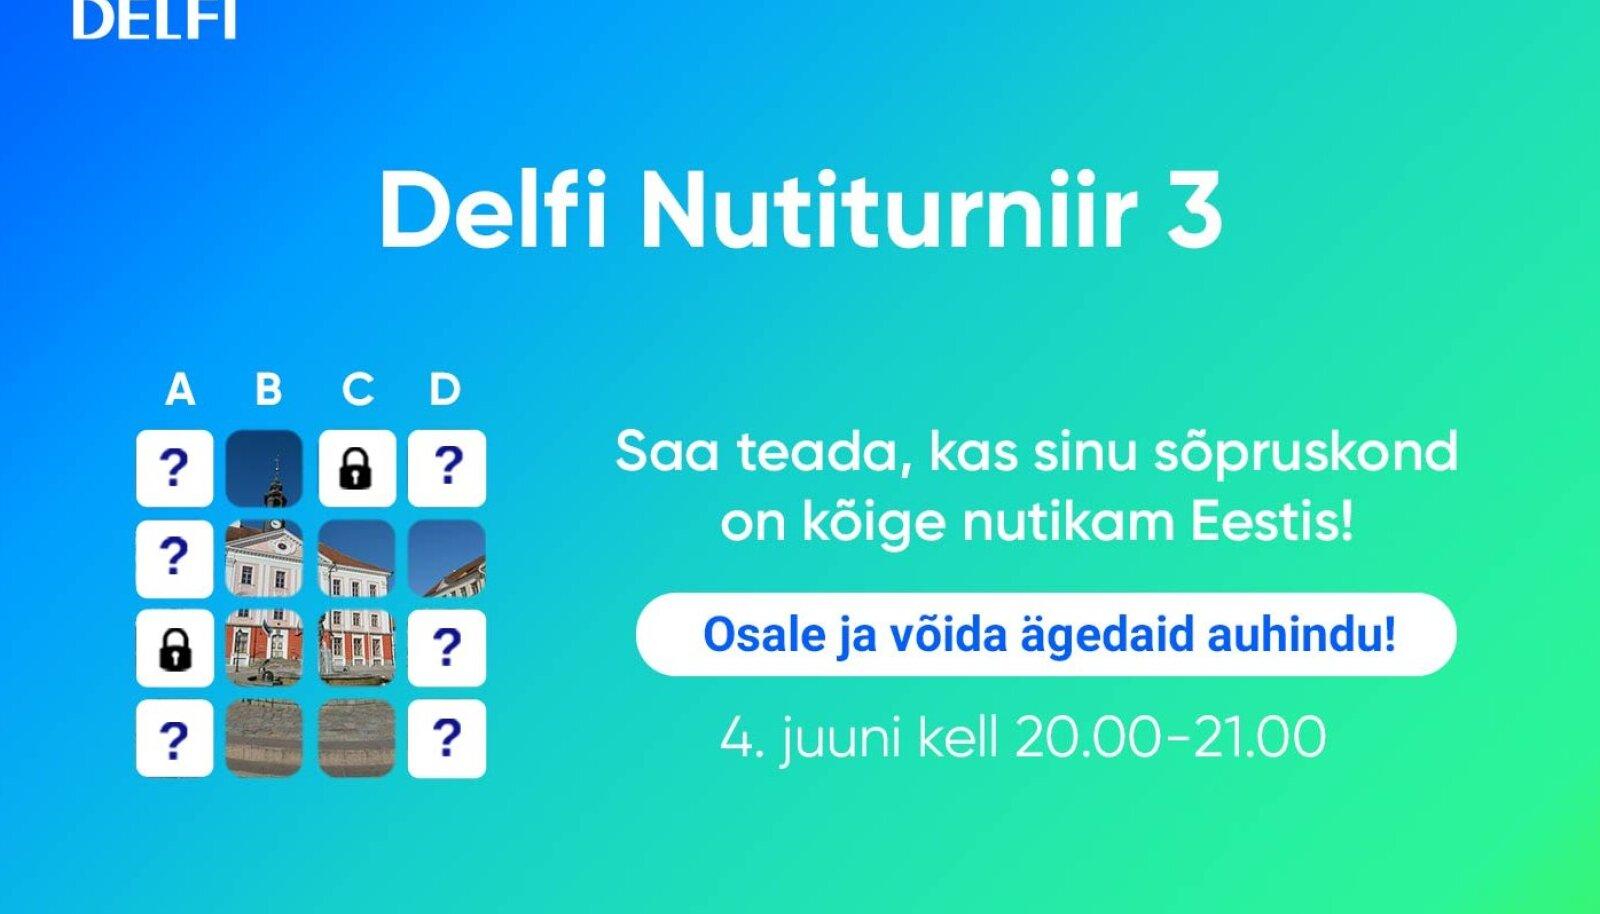 Delfi Nutiturniir 3